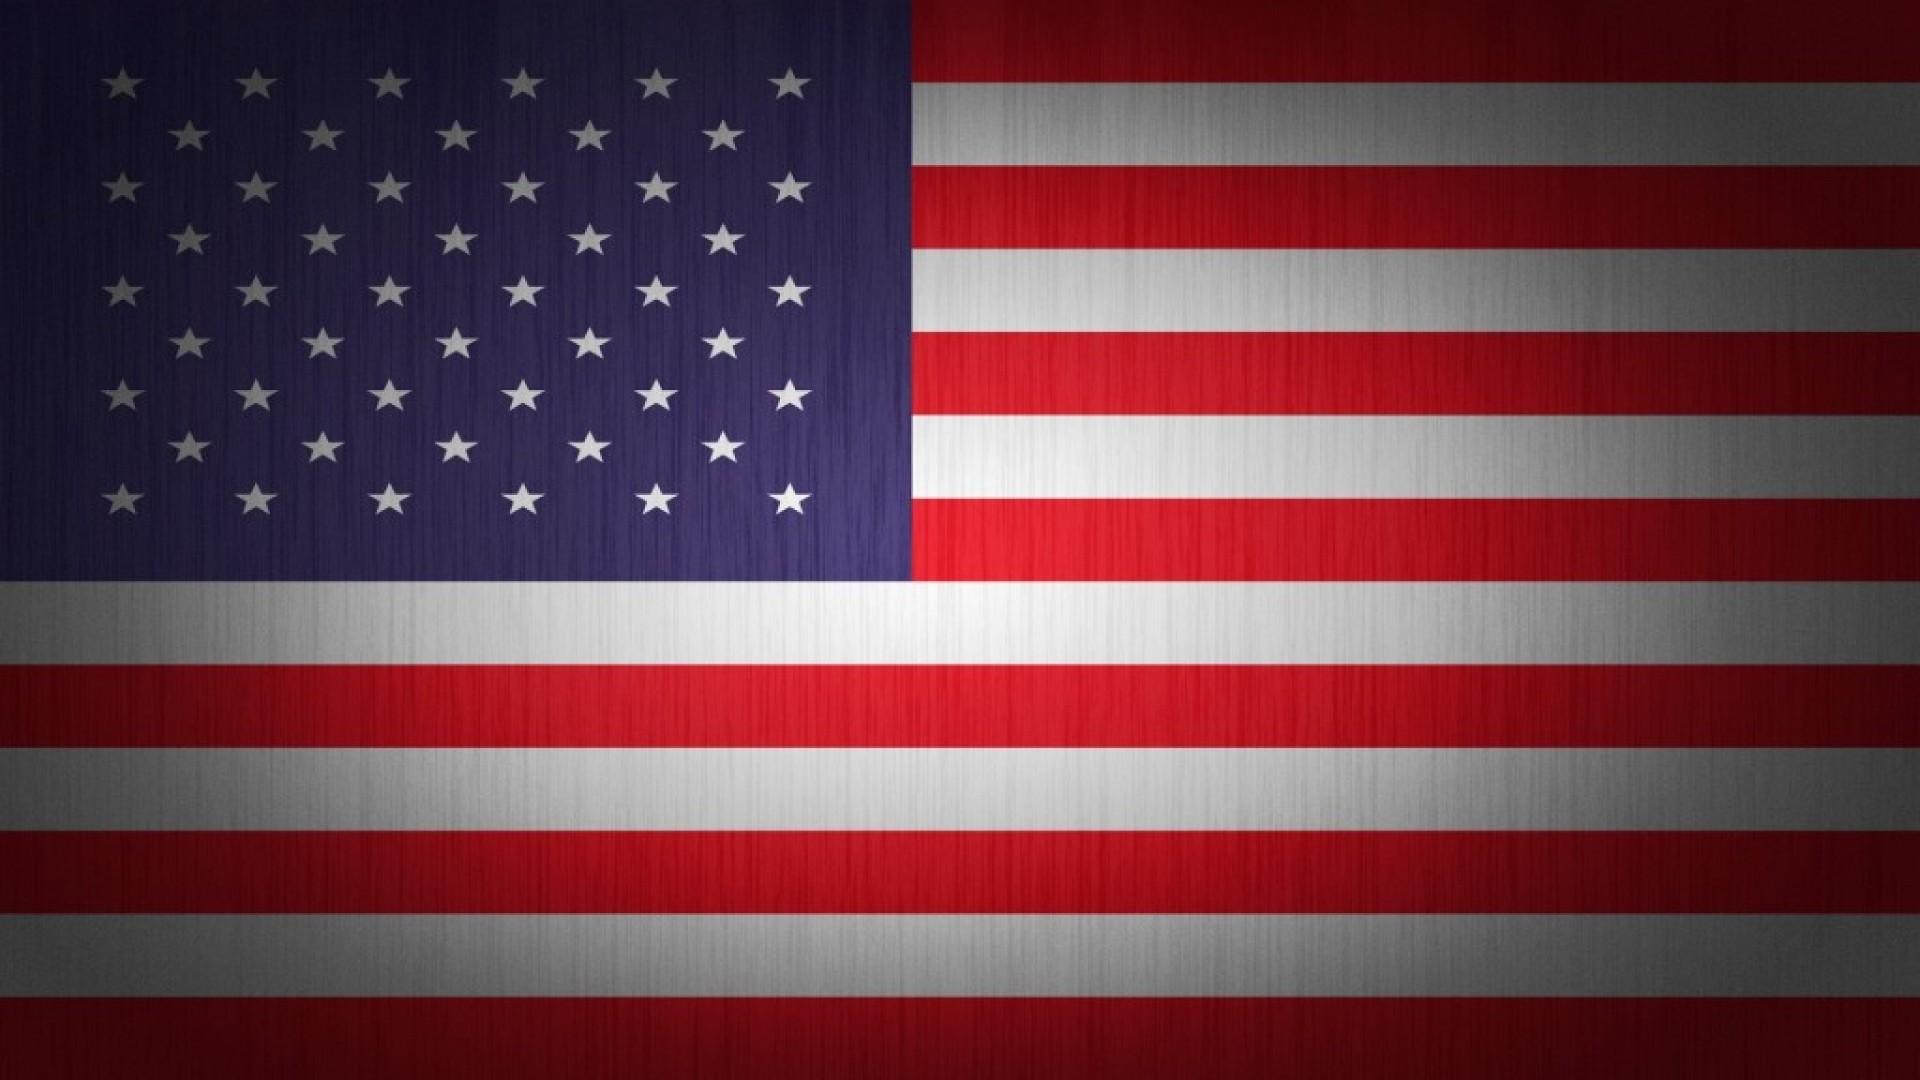 American Flag Computer Wallpaper